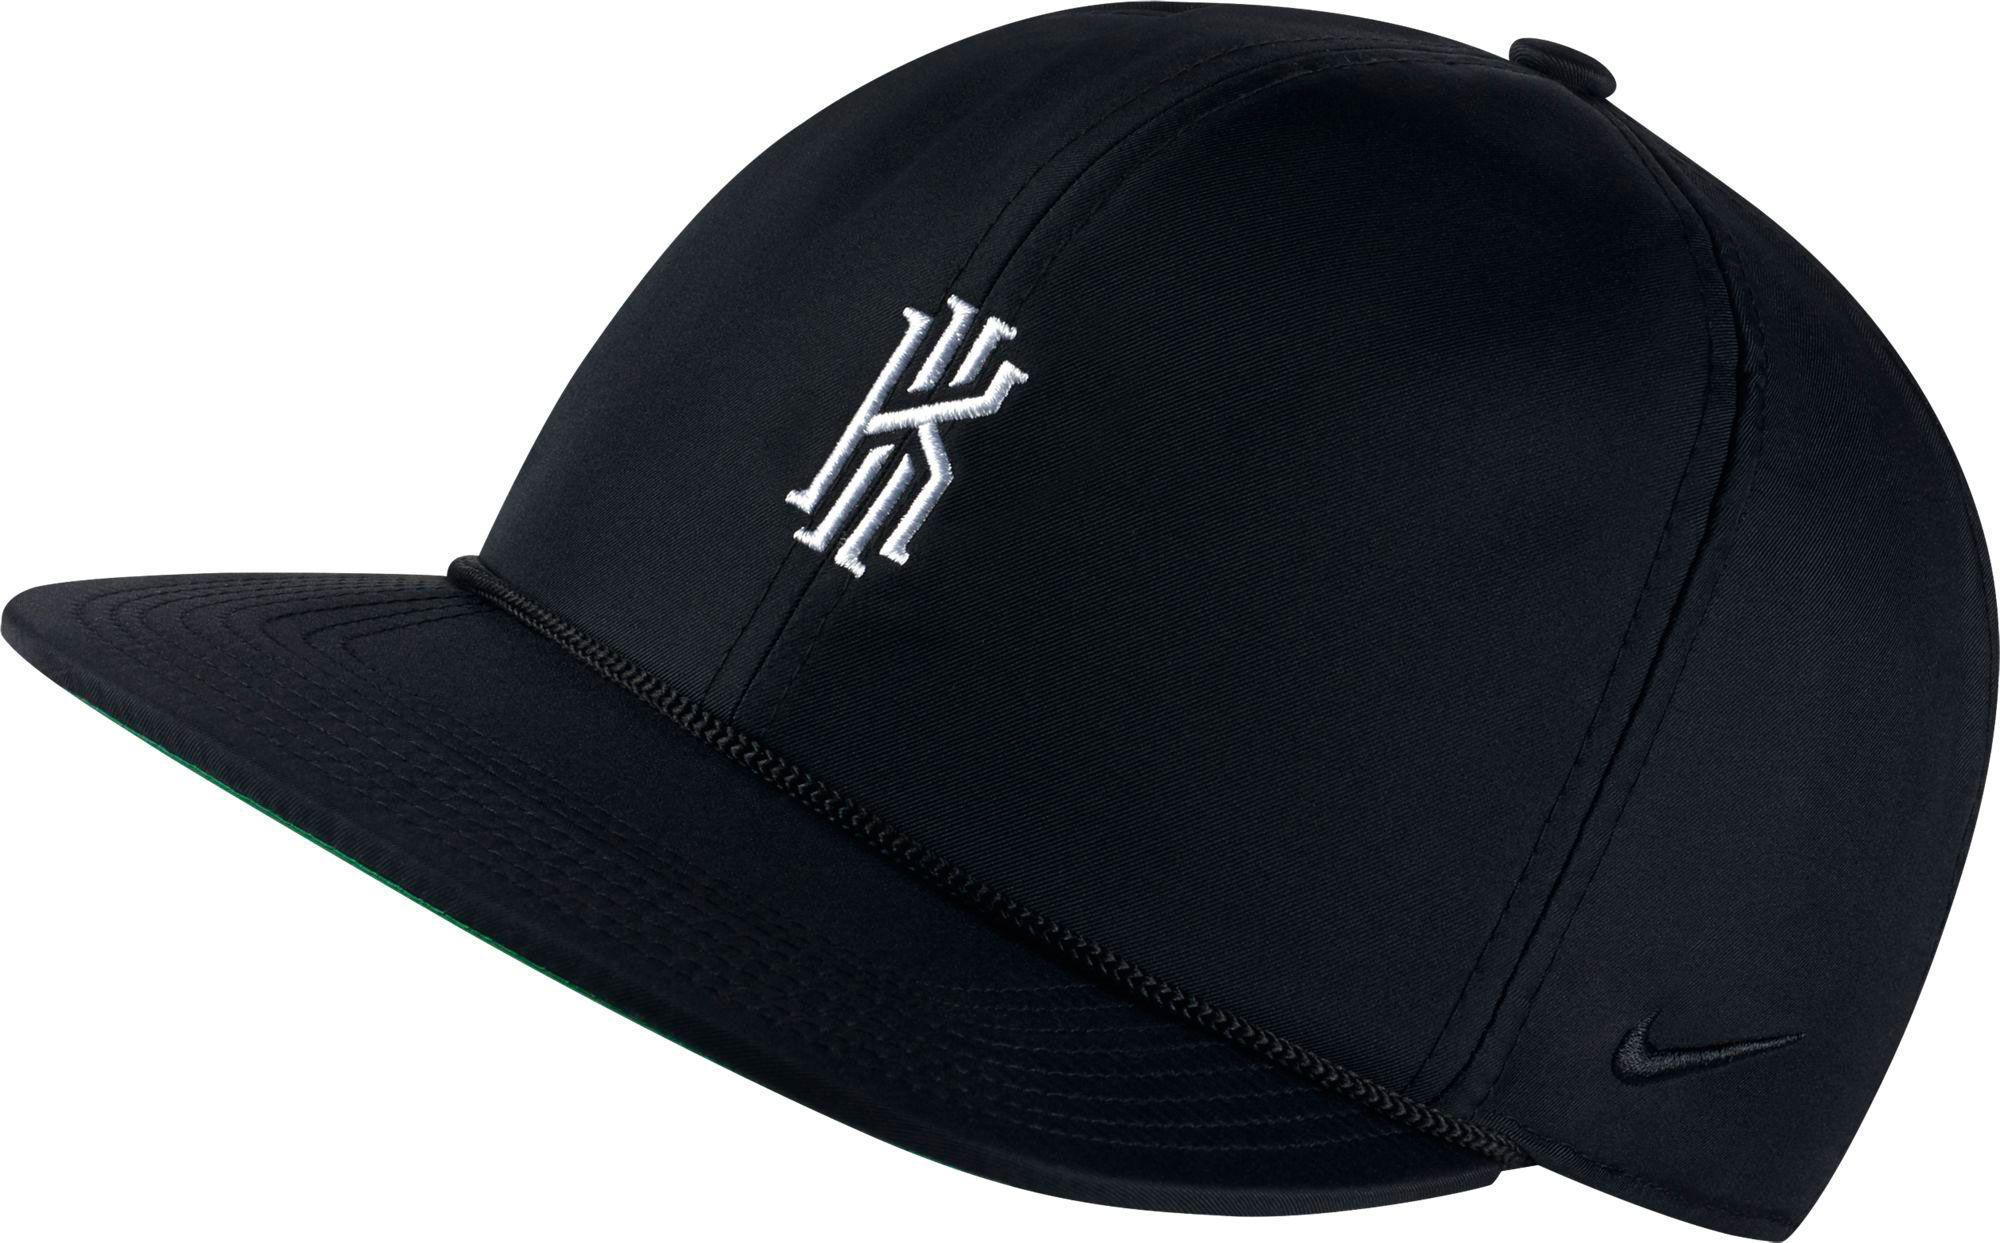 e10cdc97779 Lyst - Nike Kyrie Aerobill Dri-fit Zipback Hat in Black for Men